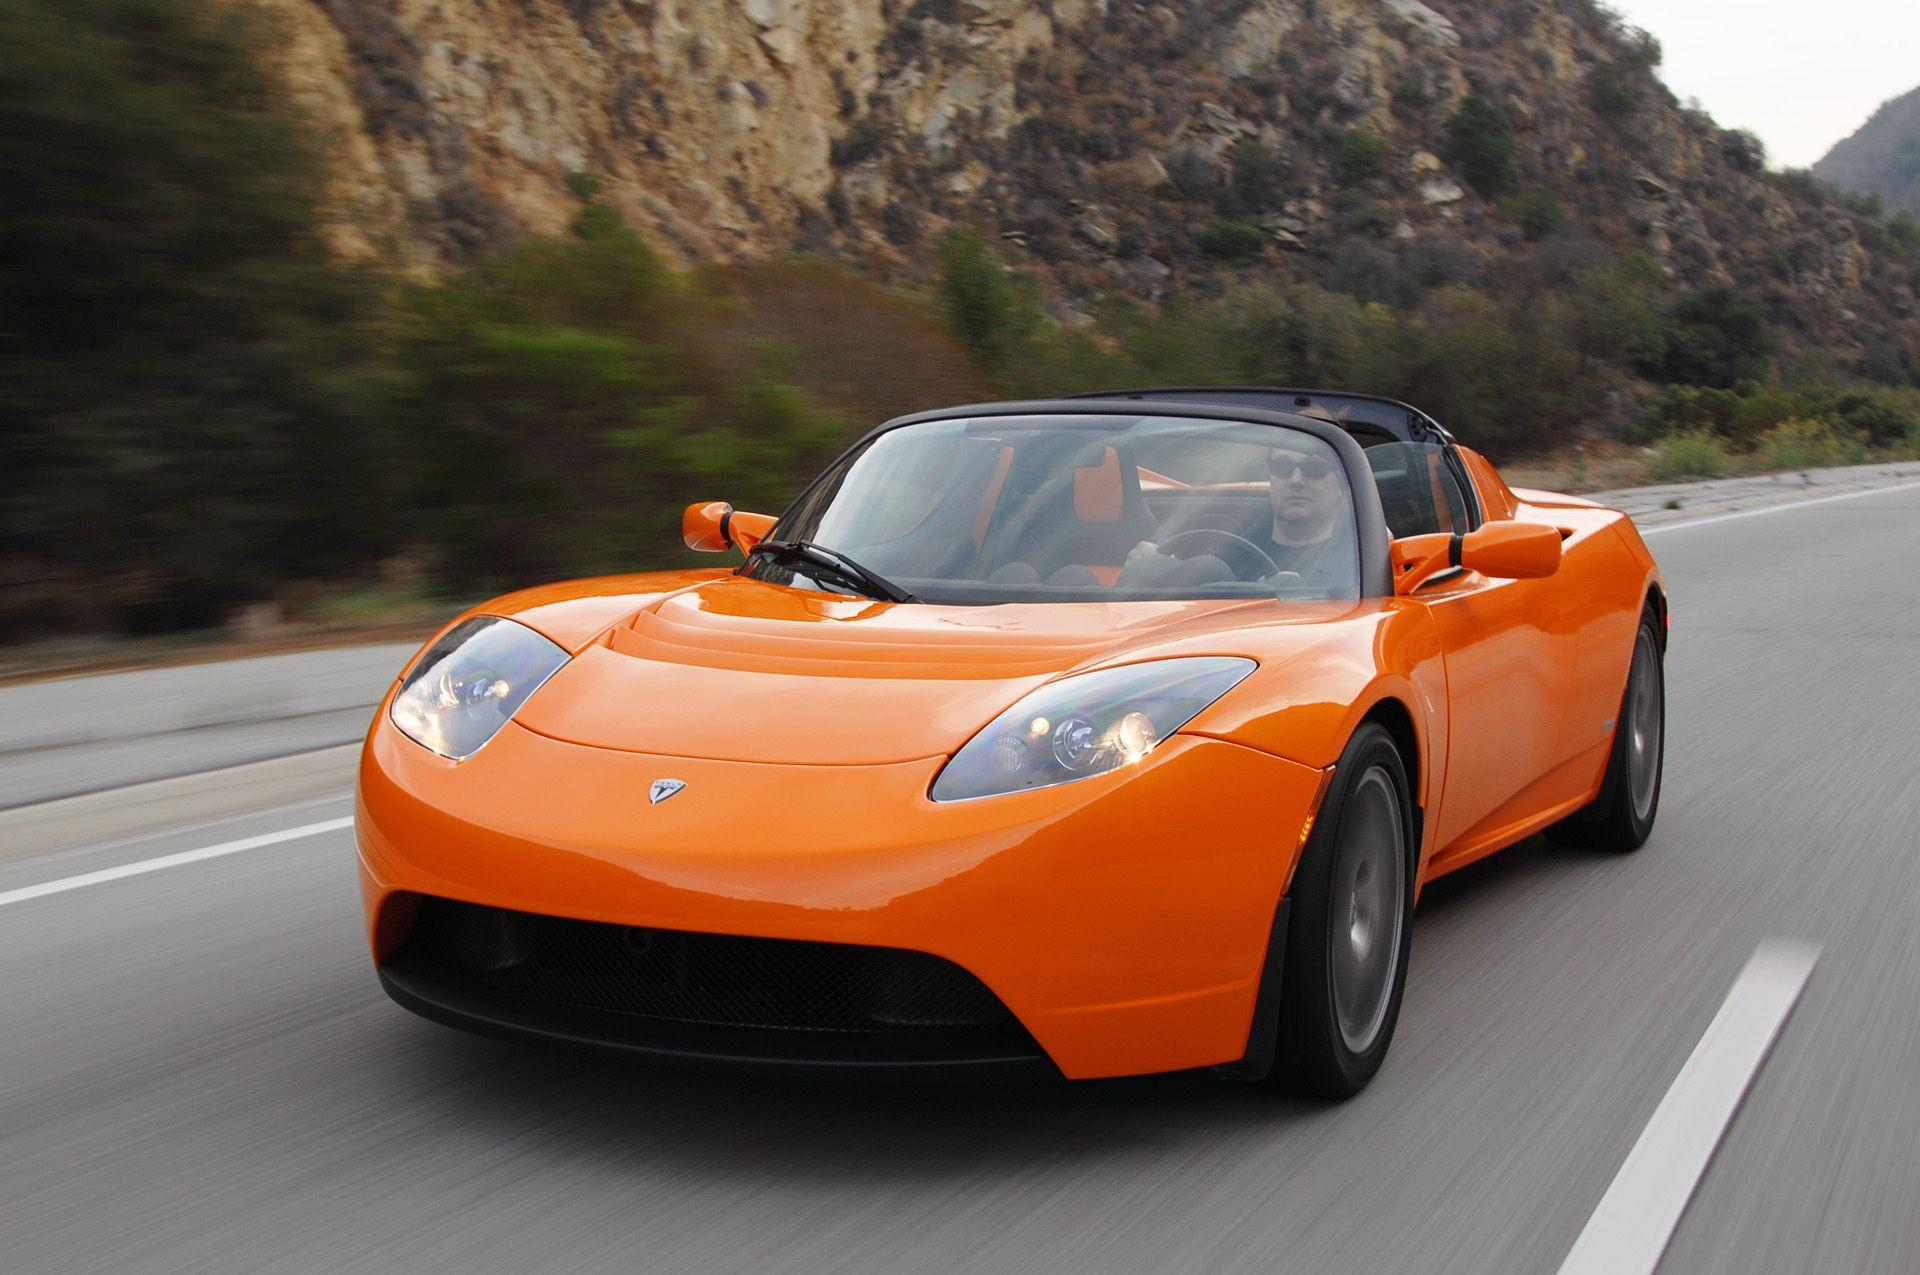 2008 Orange Tesla Roadster Tesla roadster, Electric